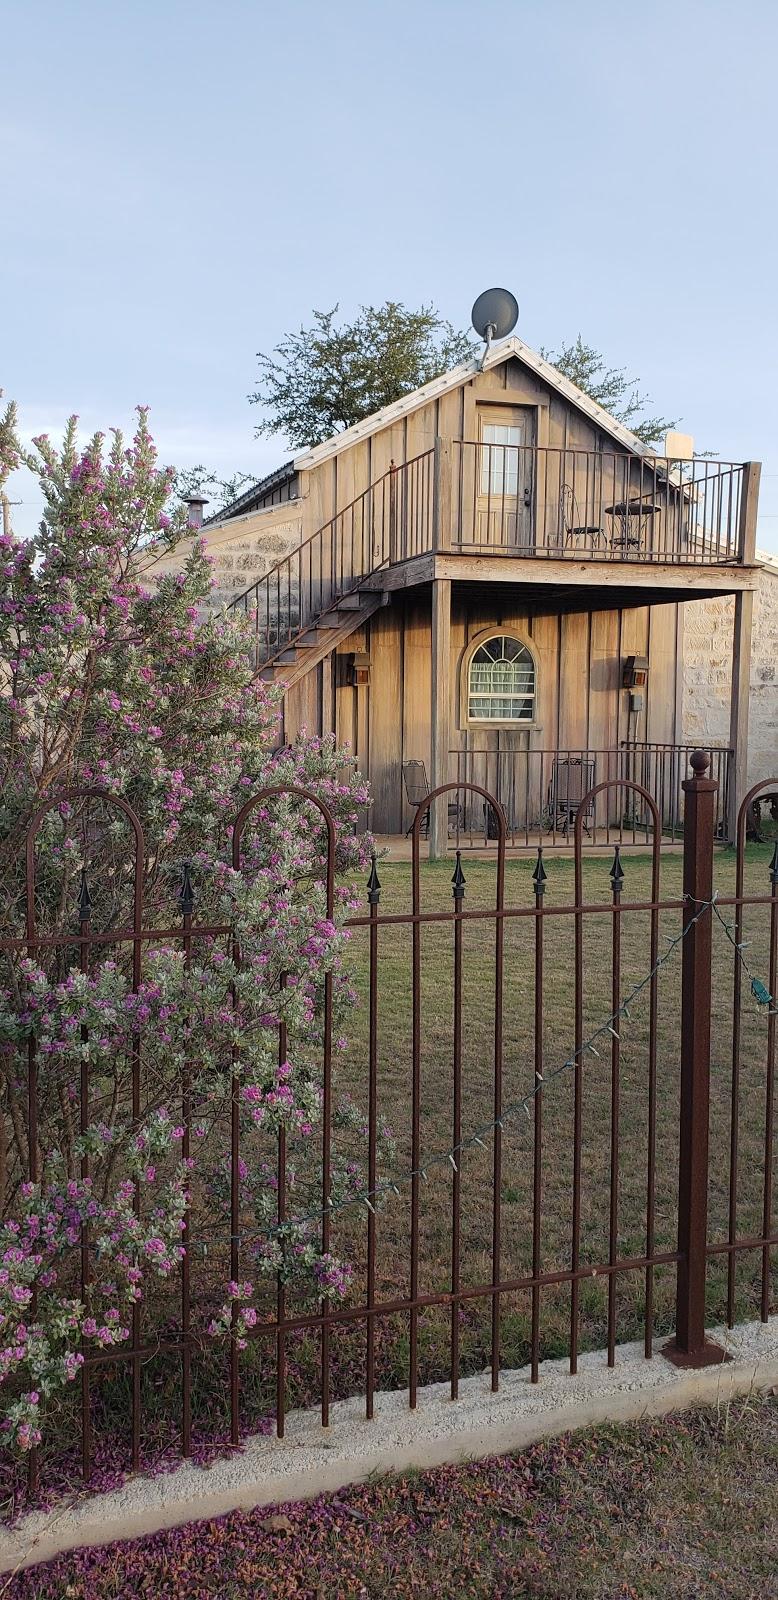 River Road Ranch Resort - lodging  | Photo 7 of 10 | Address: 160 Glad Heart Trail, Fredericksburg, TX 78624, USA | Phone: (830) 456-5756